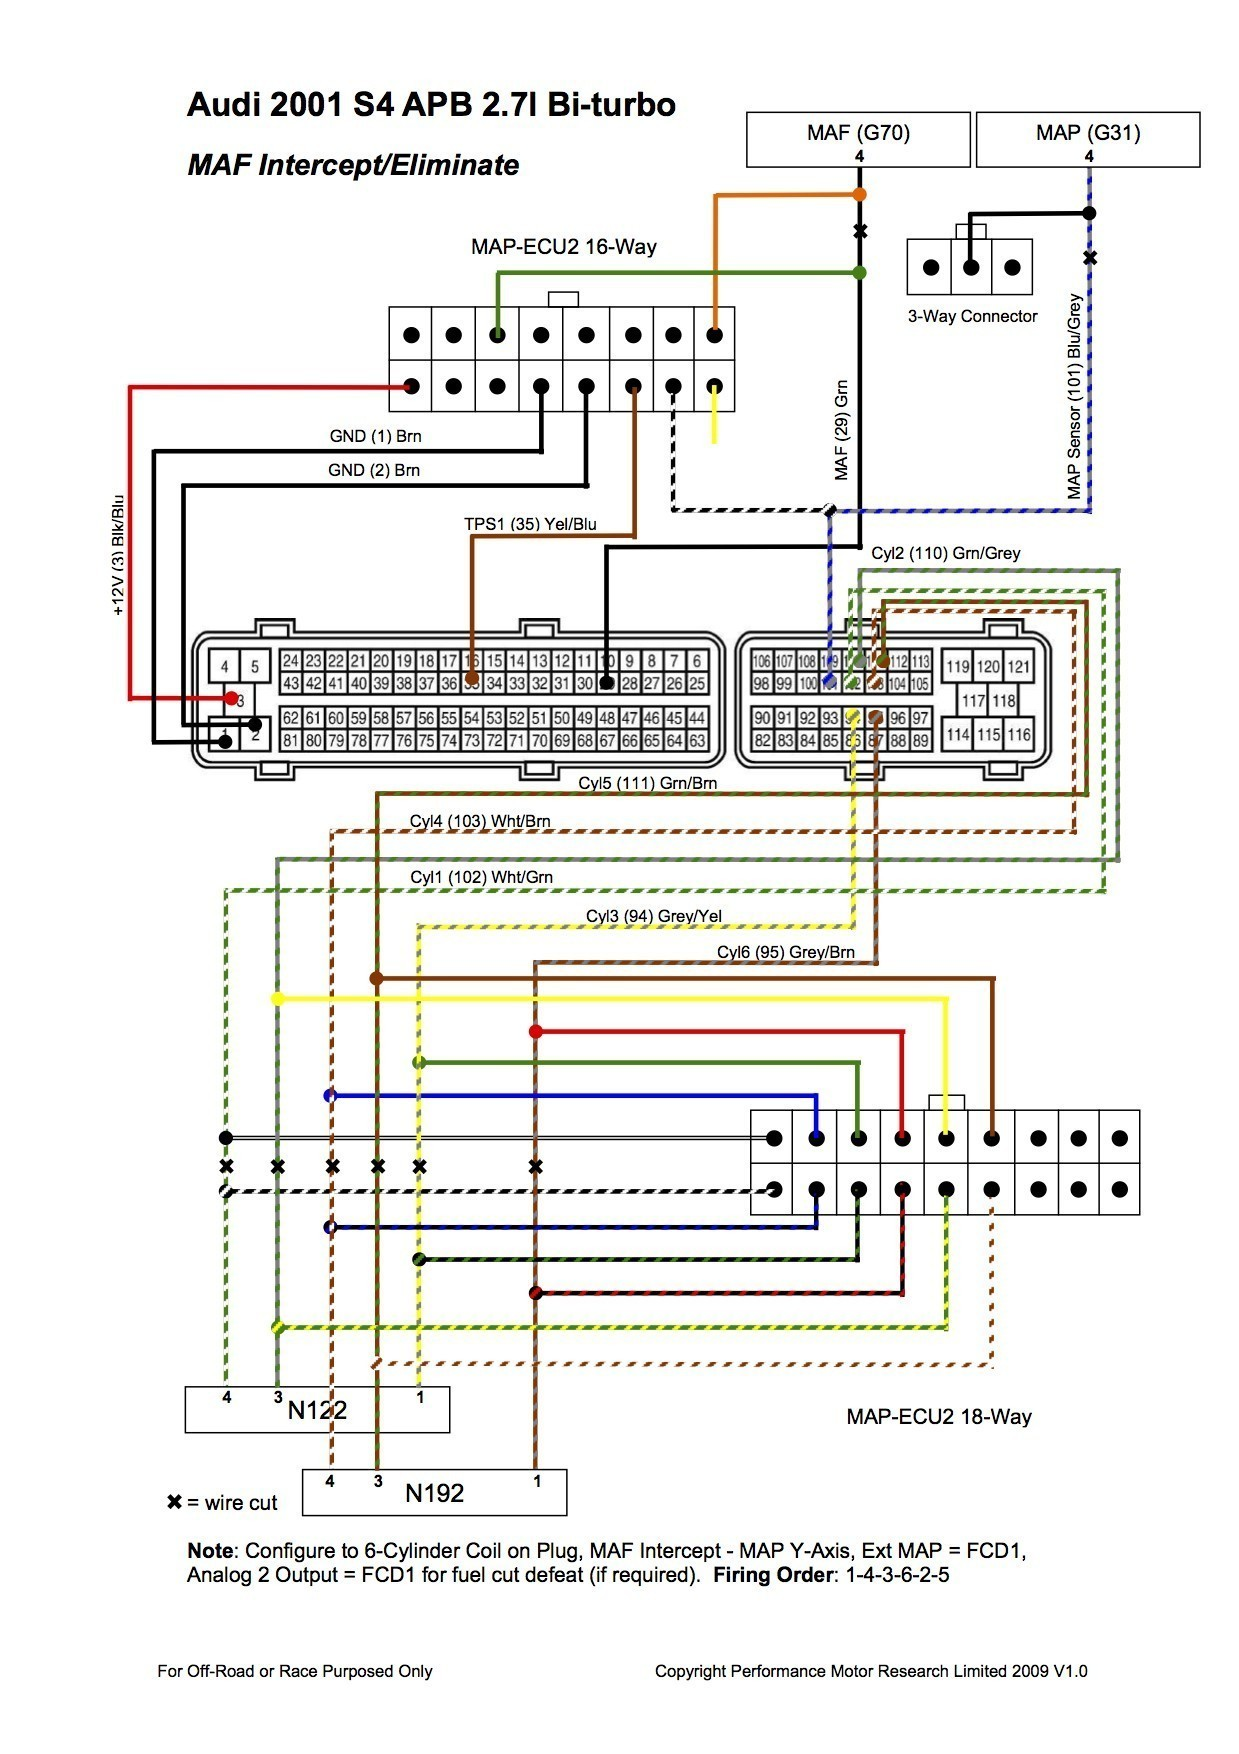 maf wiring diagram 2005 chevy corvette free wiring diagram rh abetter pw